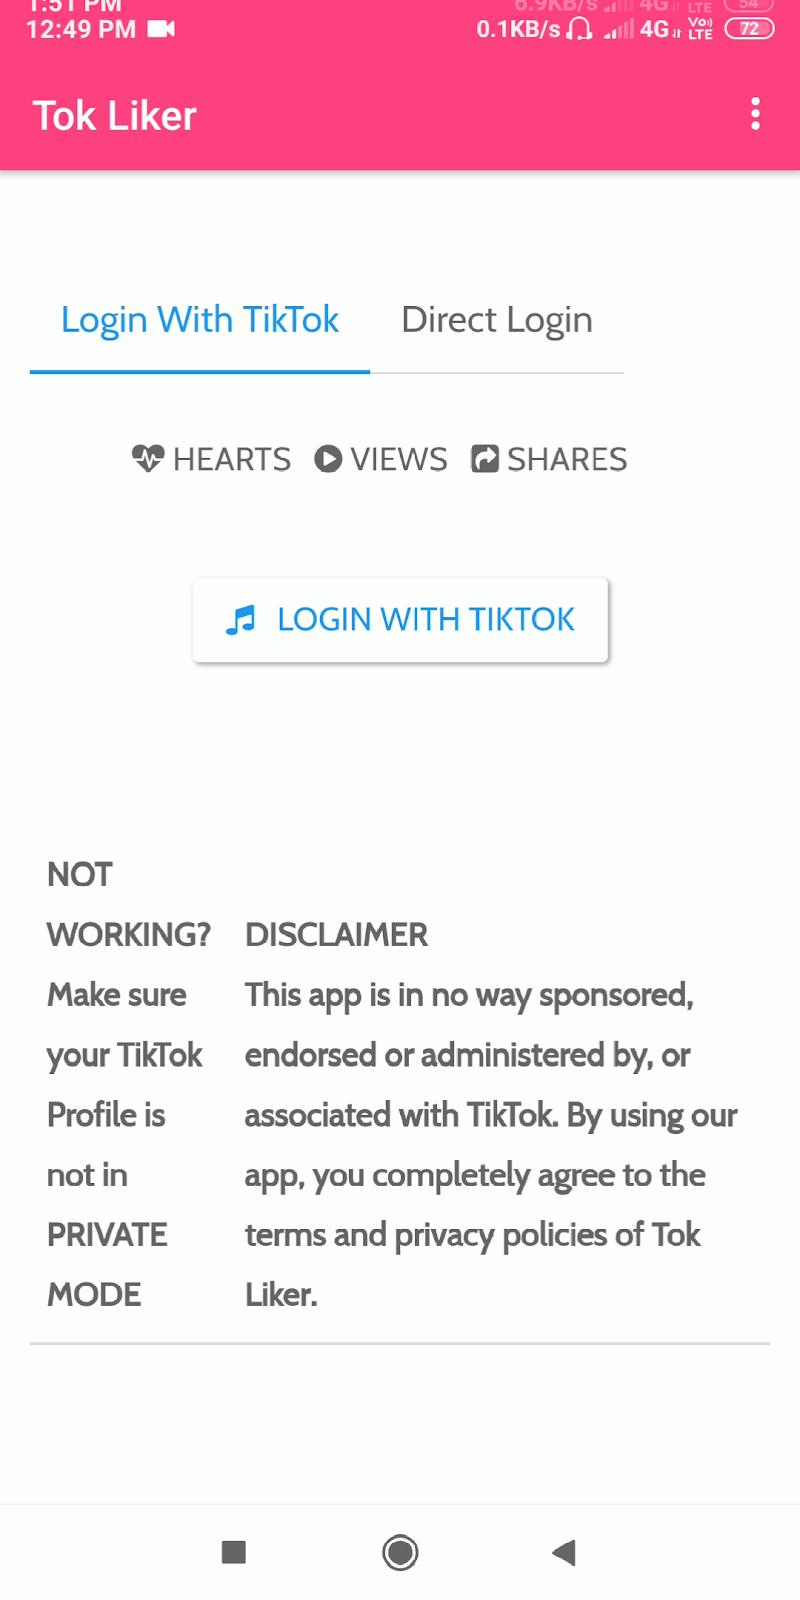 How to increase unlimited real likes on Tik Tok/Tik Tok par